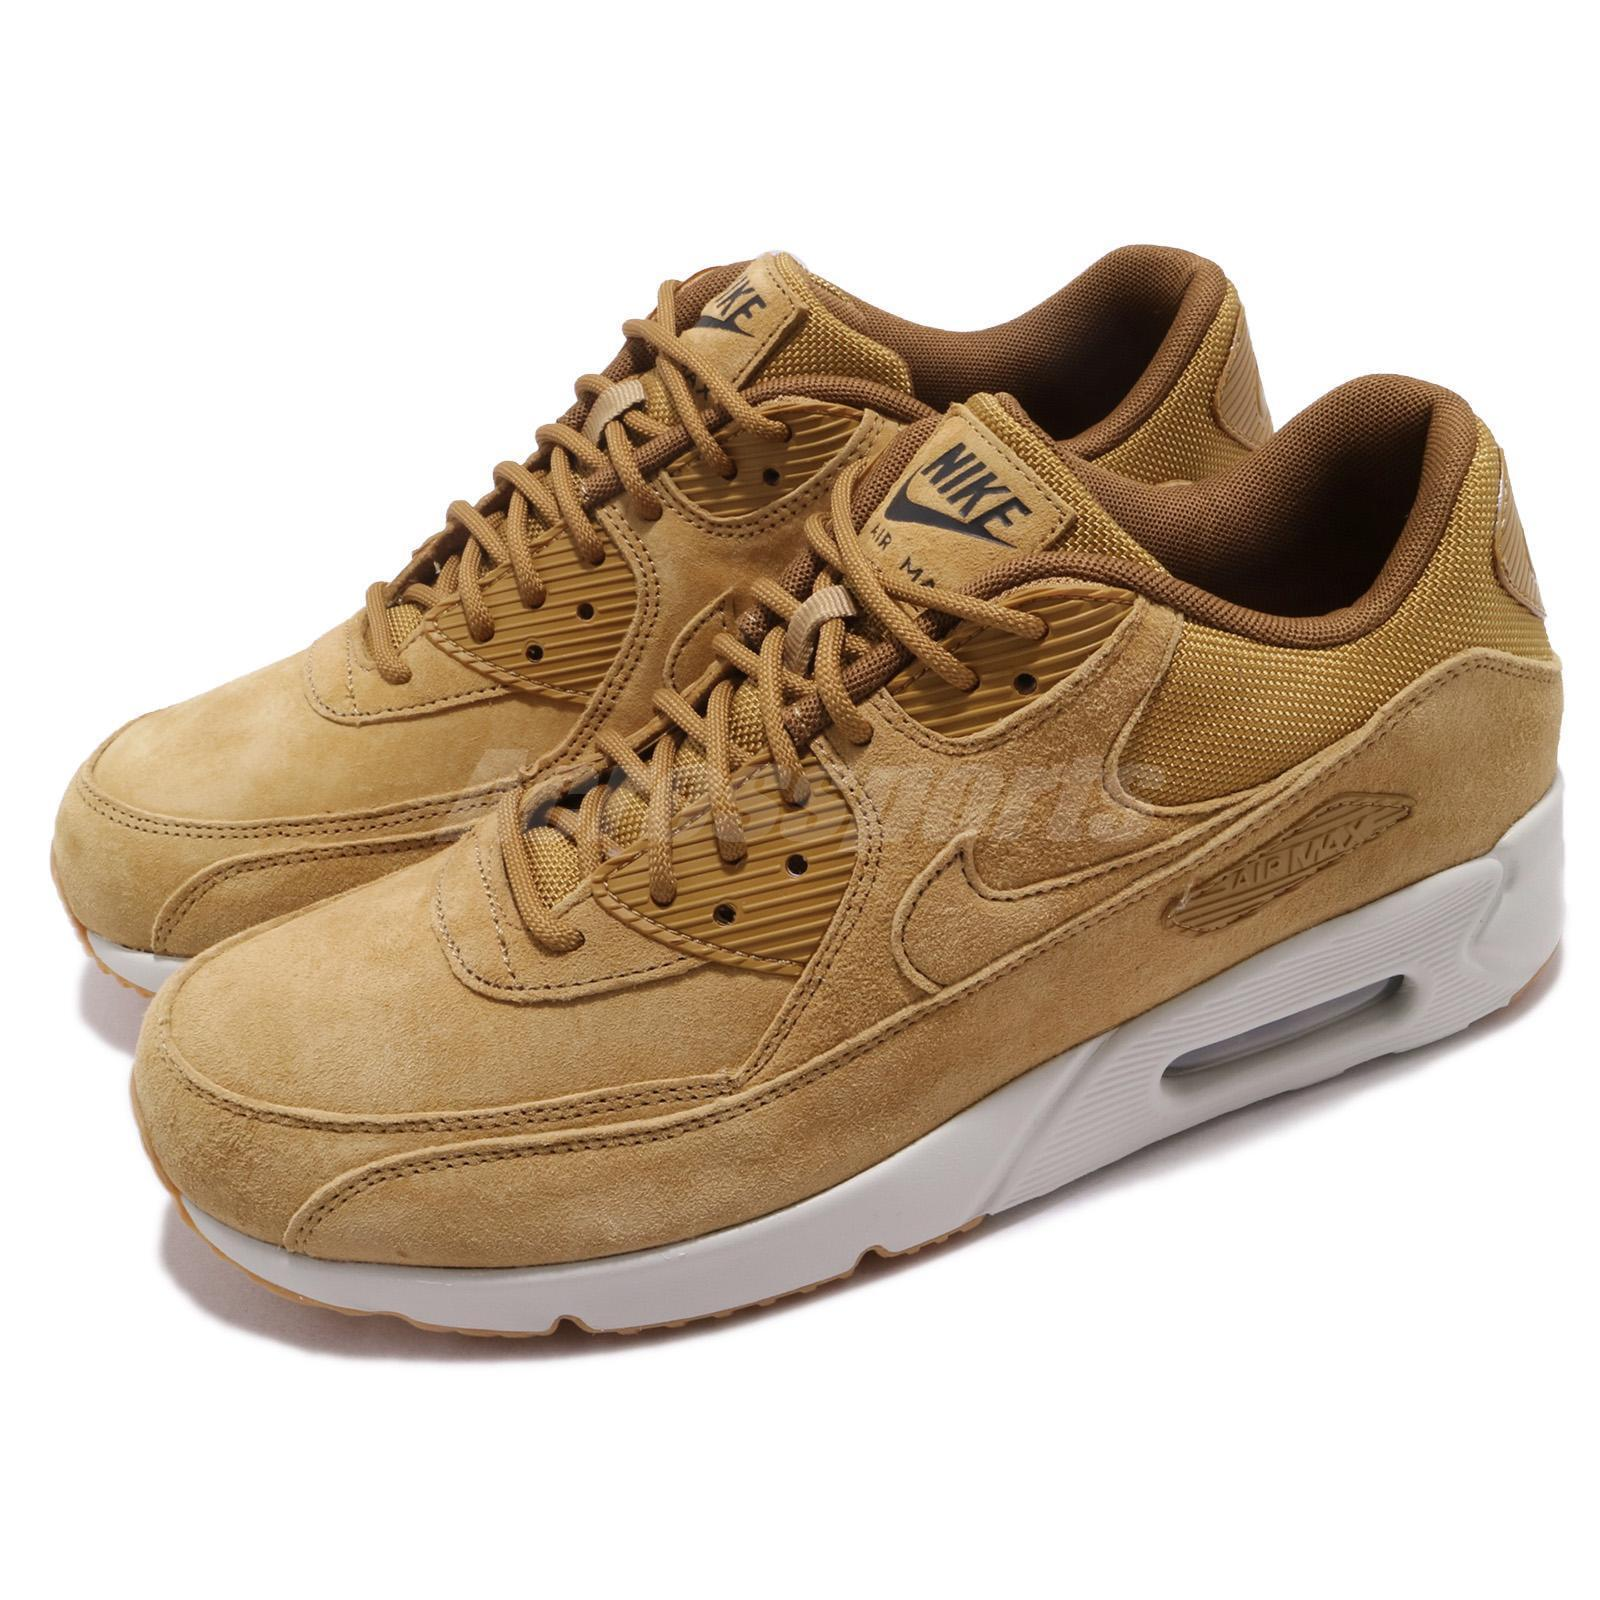 Nike Air Max 90 Ultra 2.0 LTR Wheat Light Light Light Bone Men Running shoes 924447-700 e59b8a